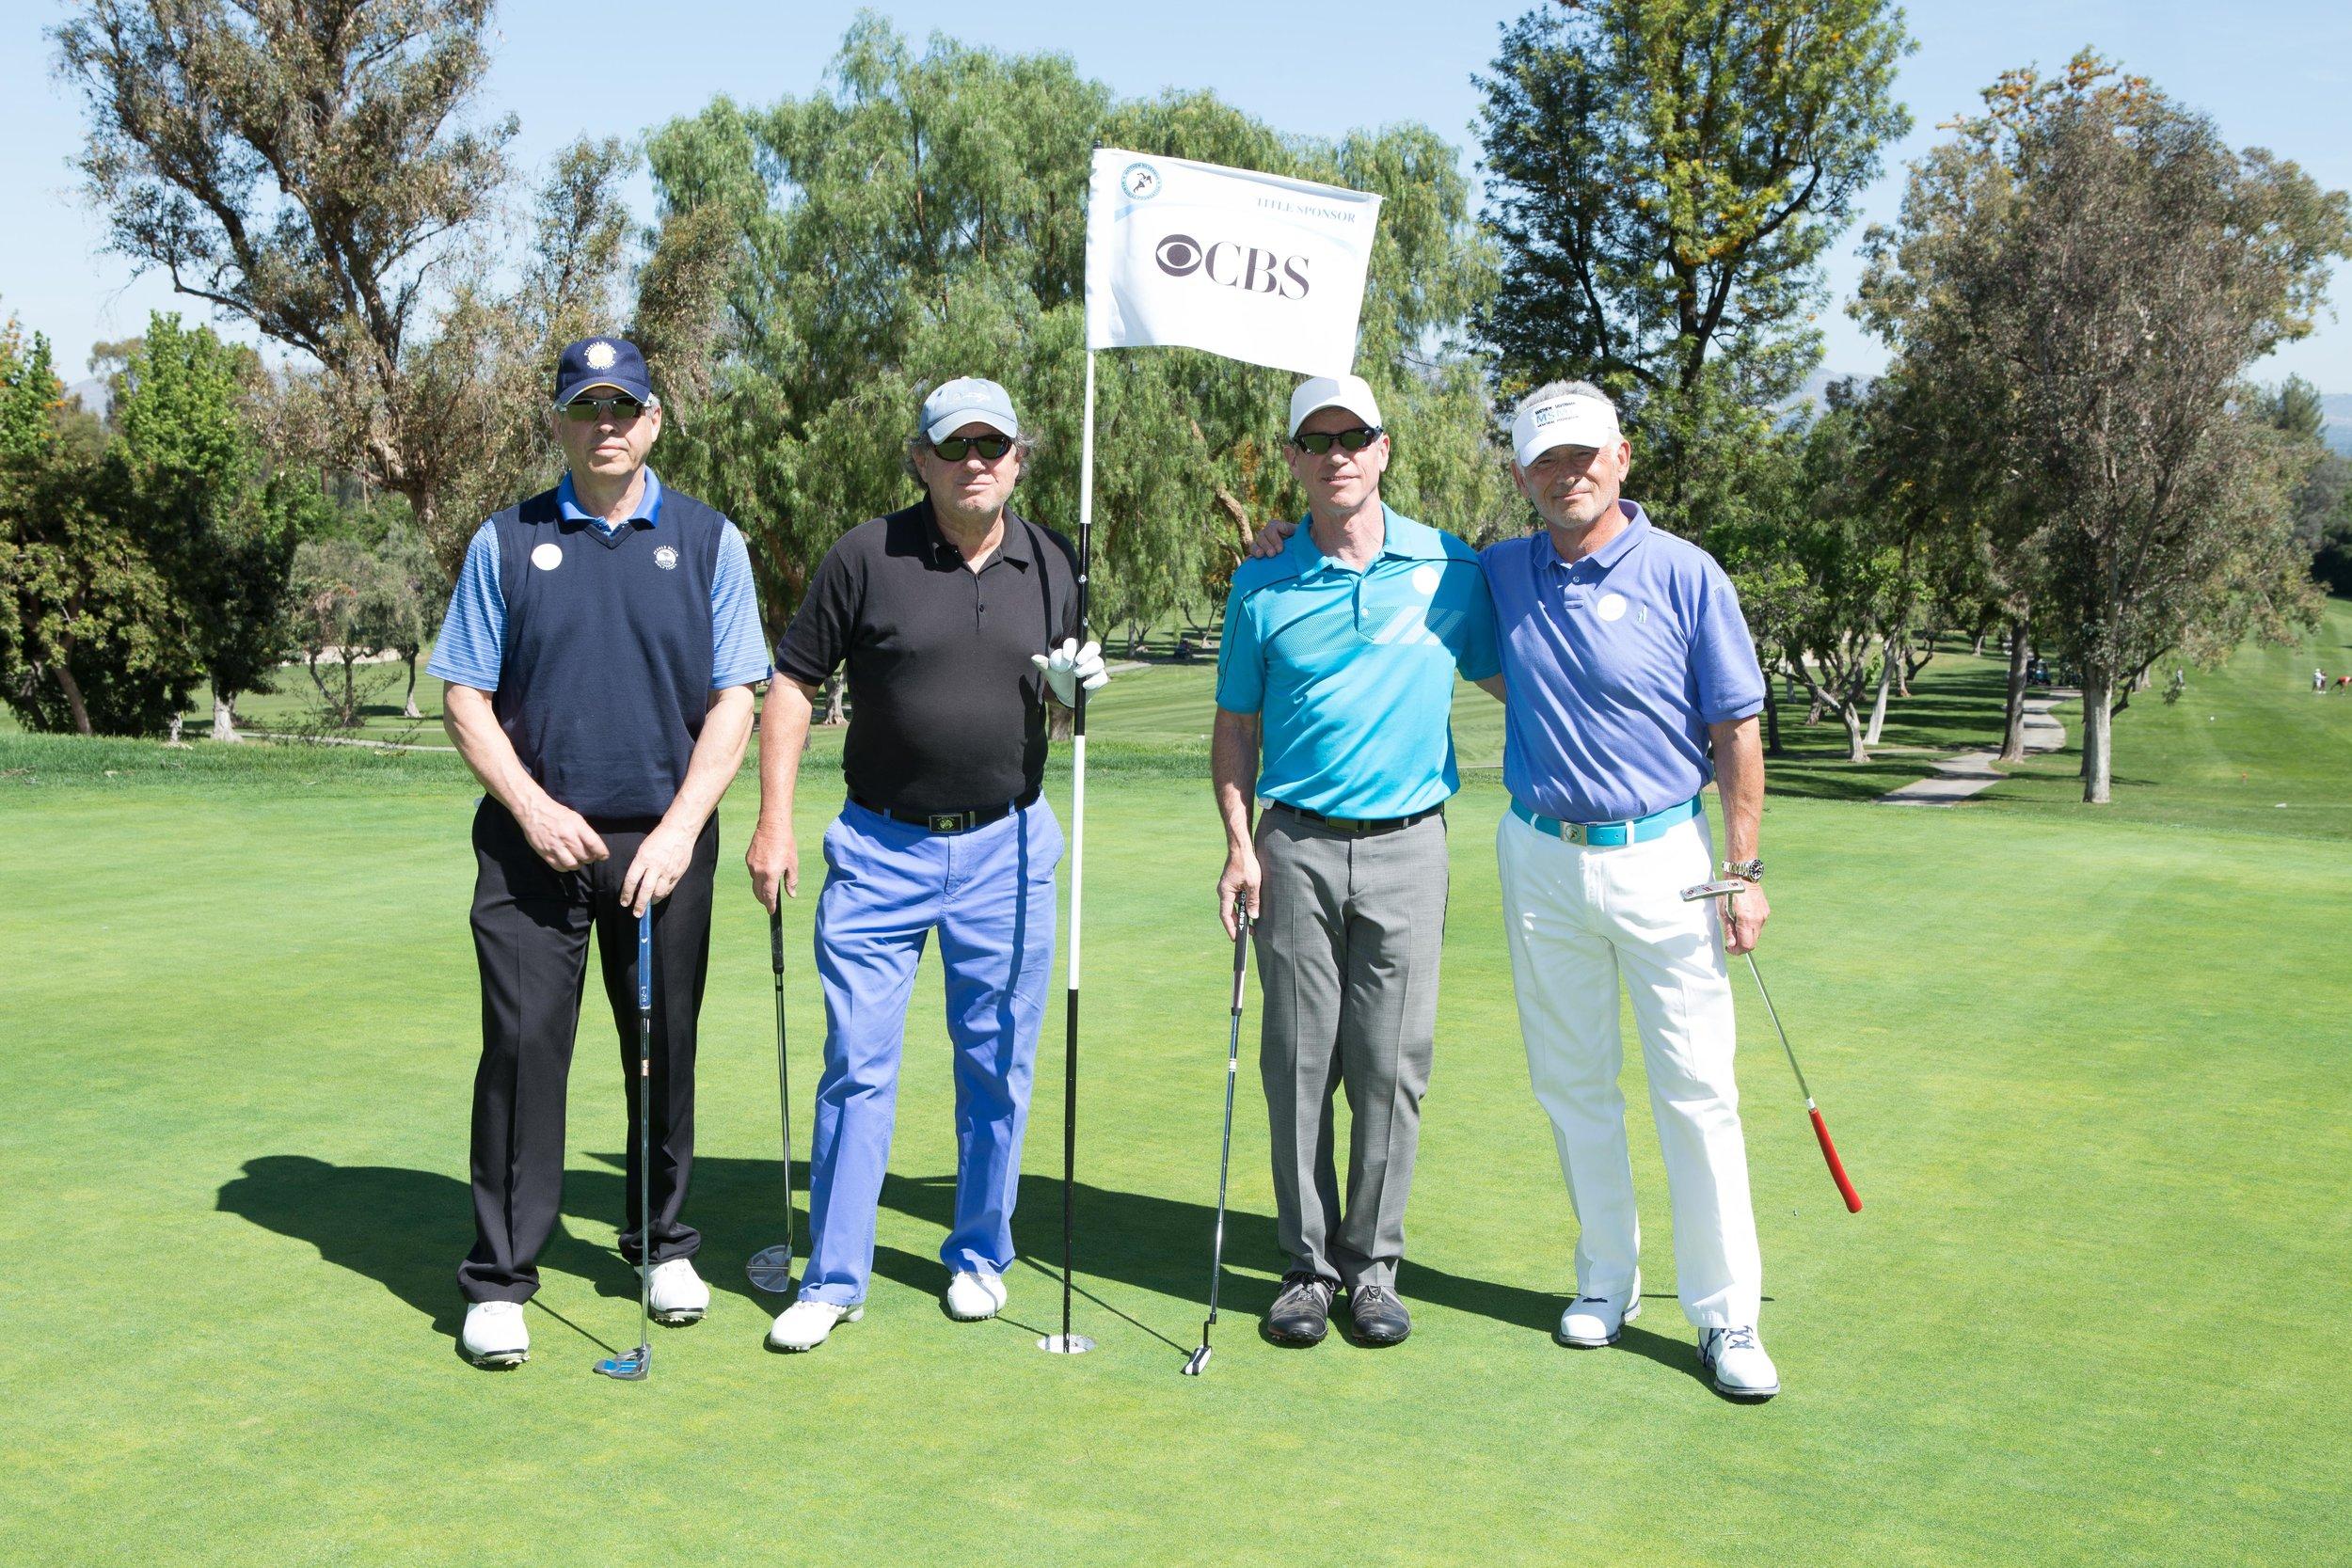 IMG_7808-Ron & golfers.jpg